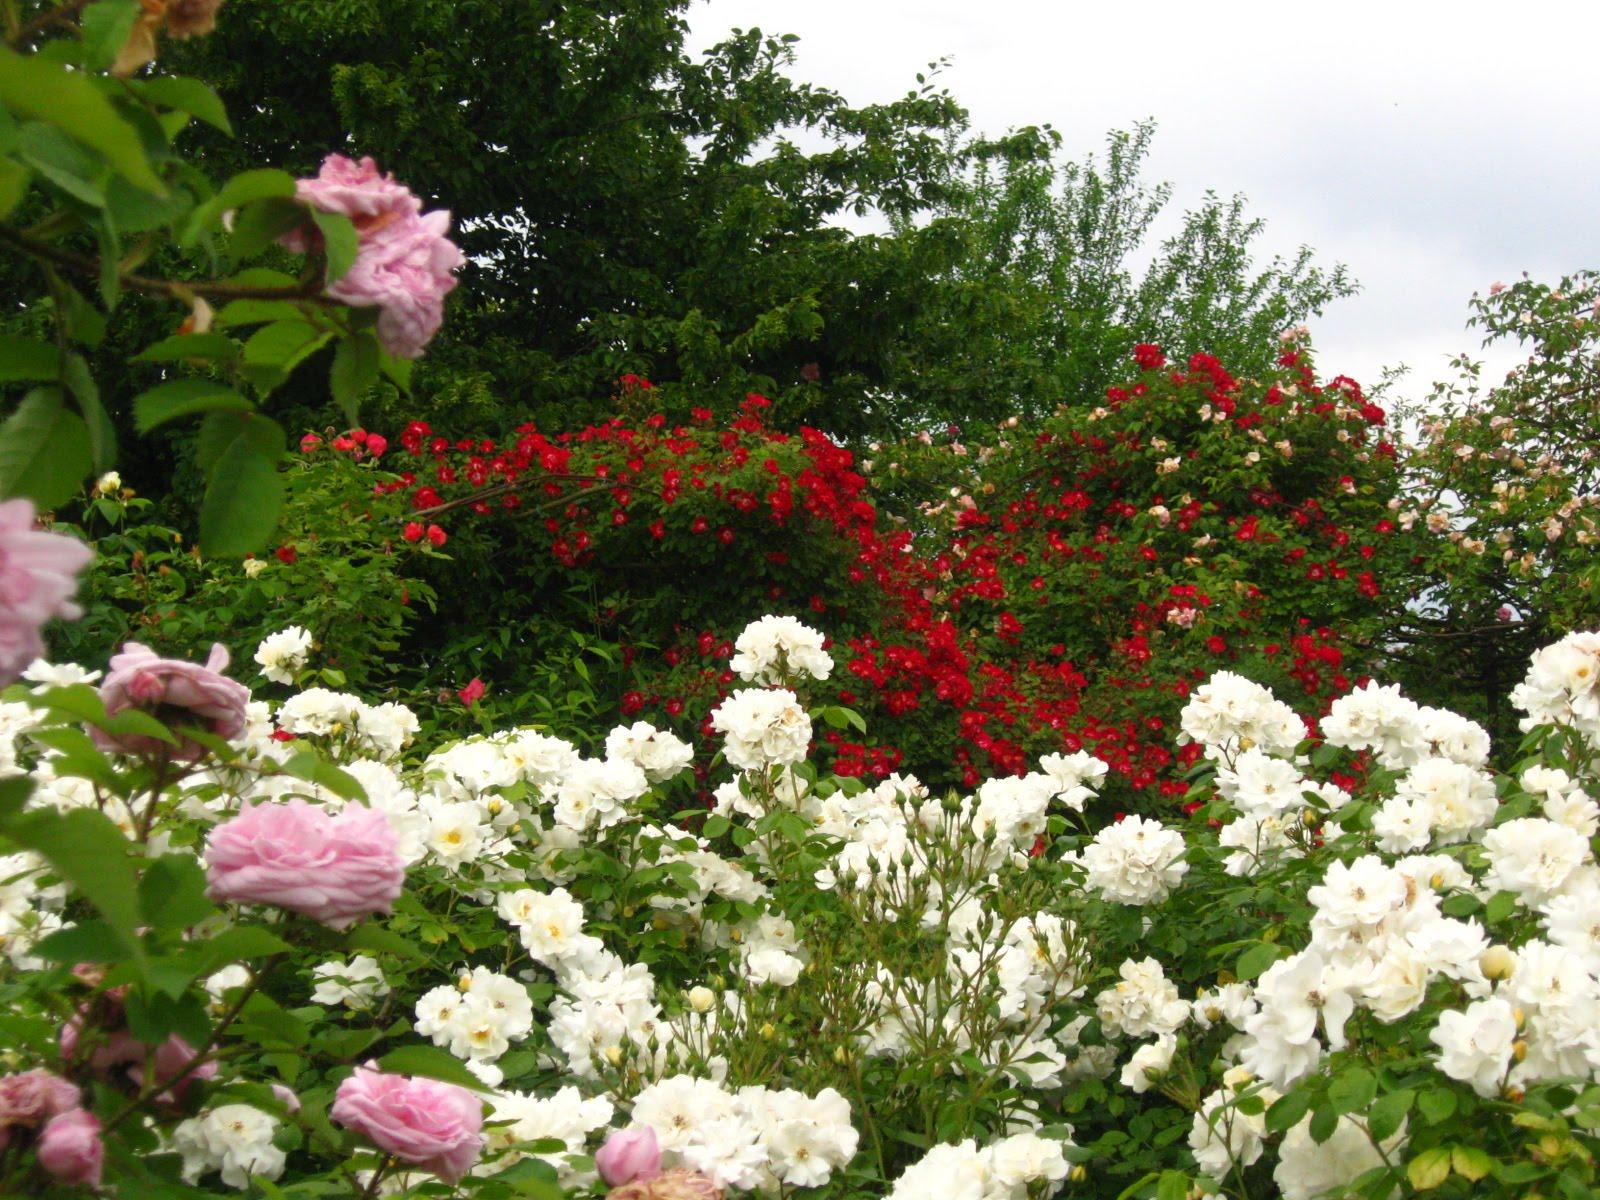 Renato photoblog giardino rosa mundi - Giardino con rose ...